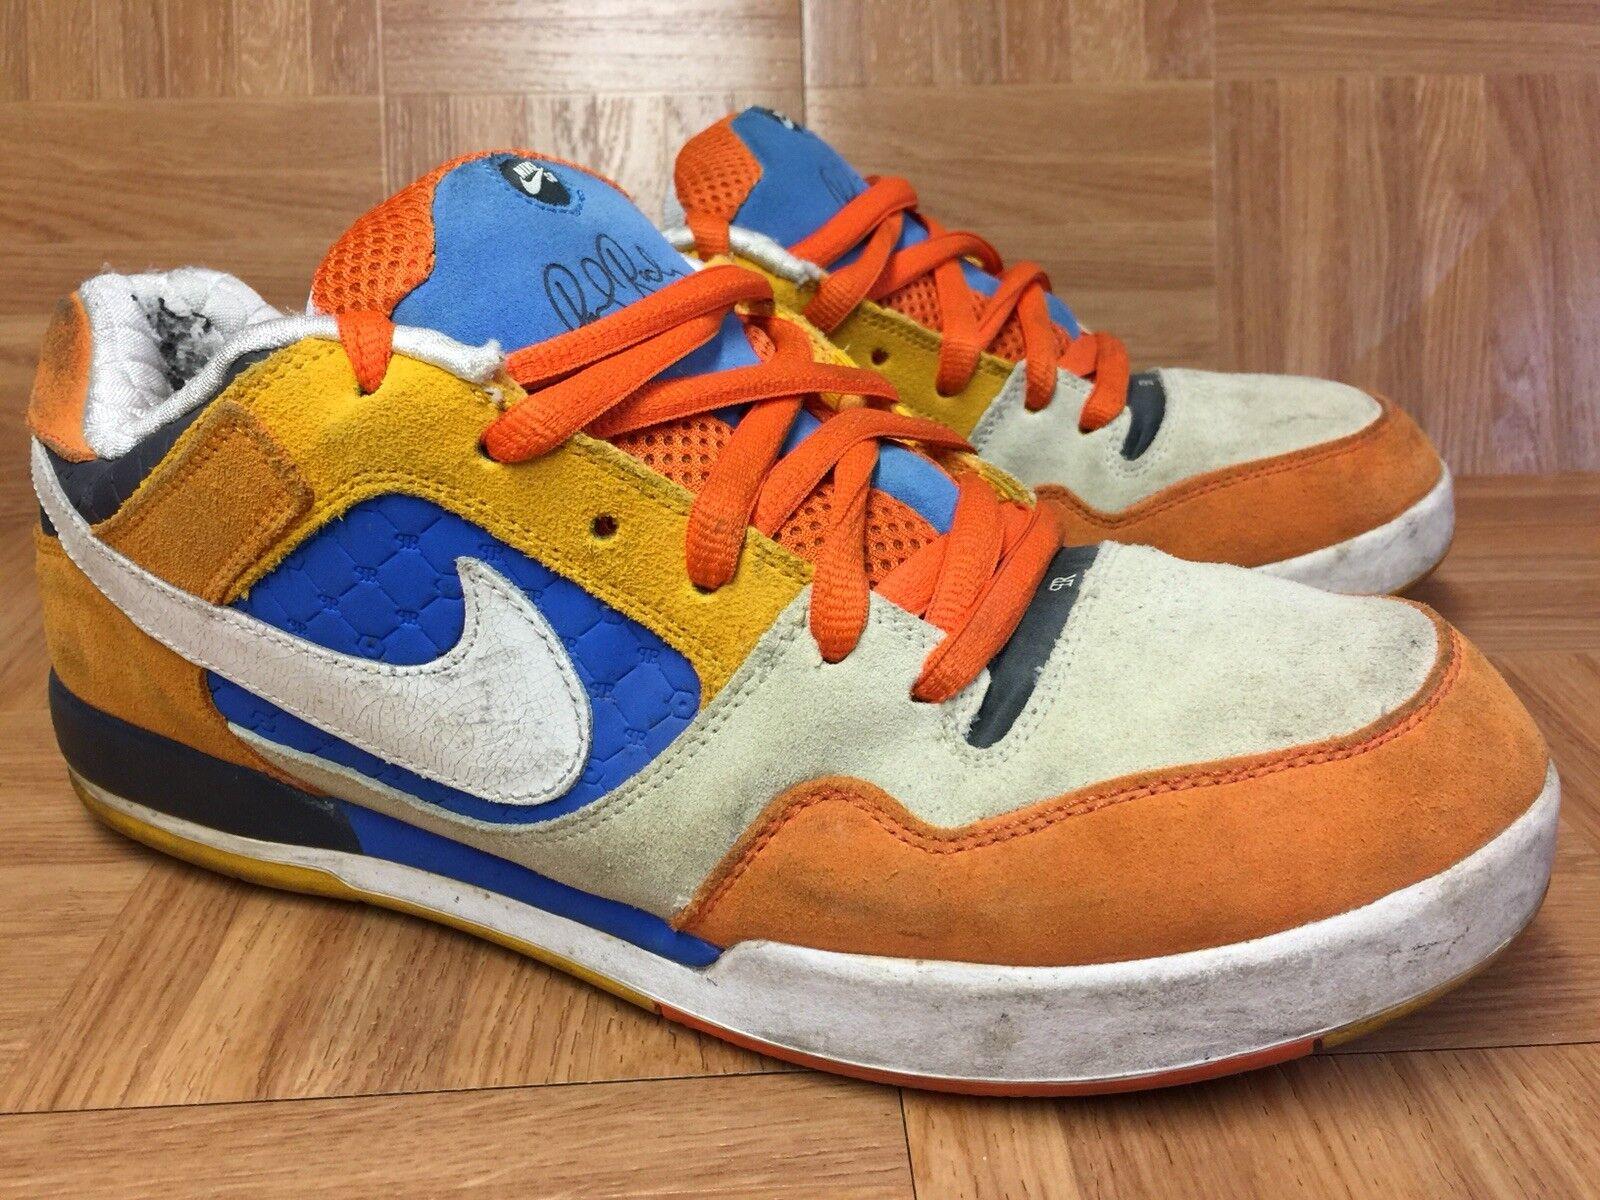 RARE? Nike Air Zoom Paul Rodriguez 2 Orange Blaze Sz 12 2008 315459-811 Uomo's